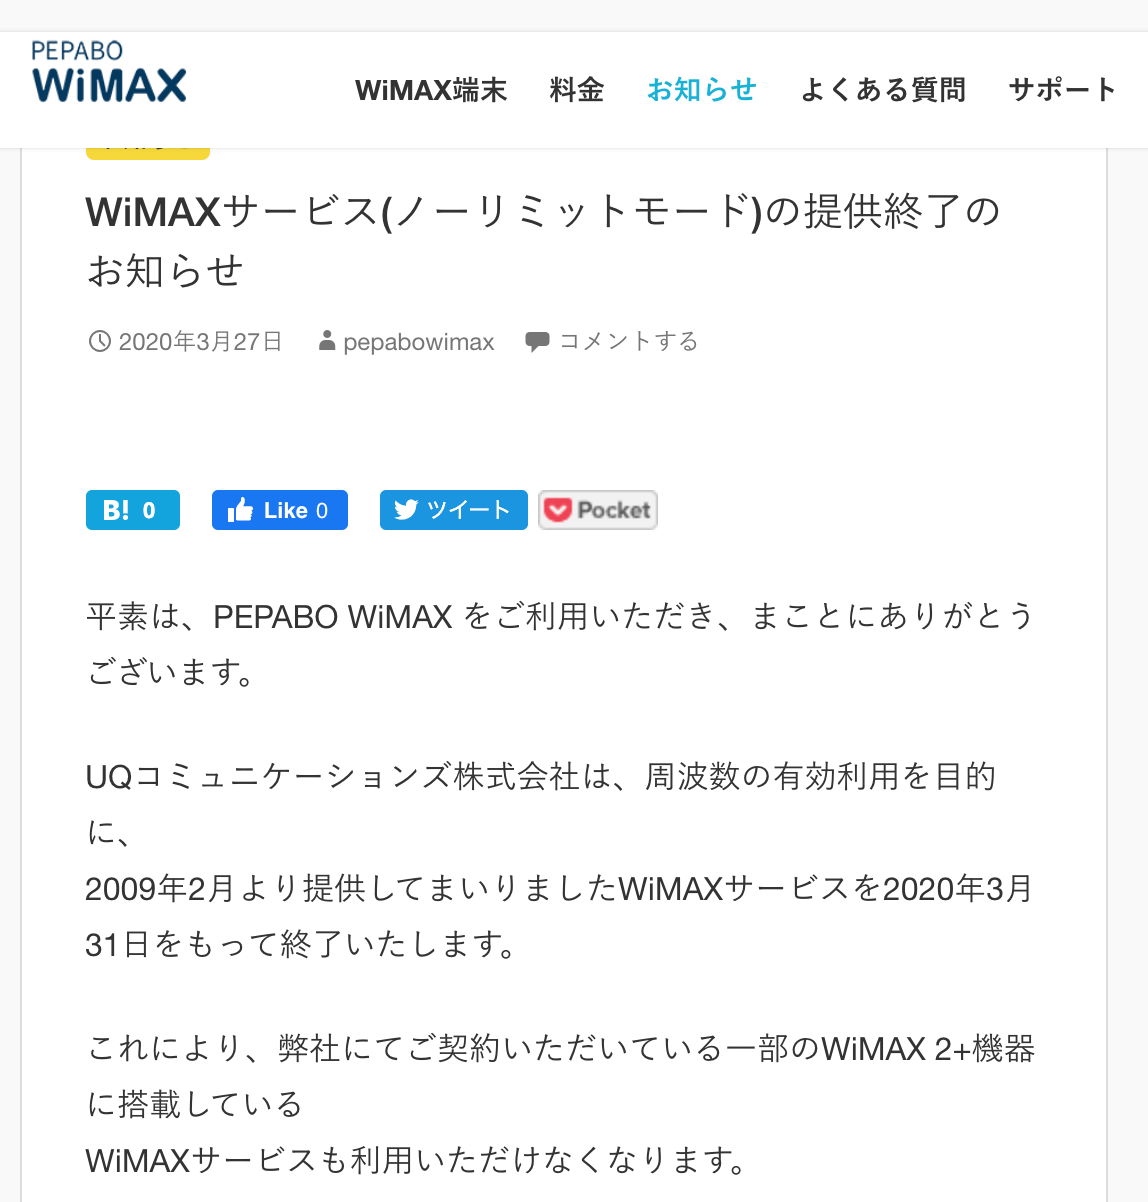 PEPABO WiMAXのトップページ